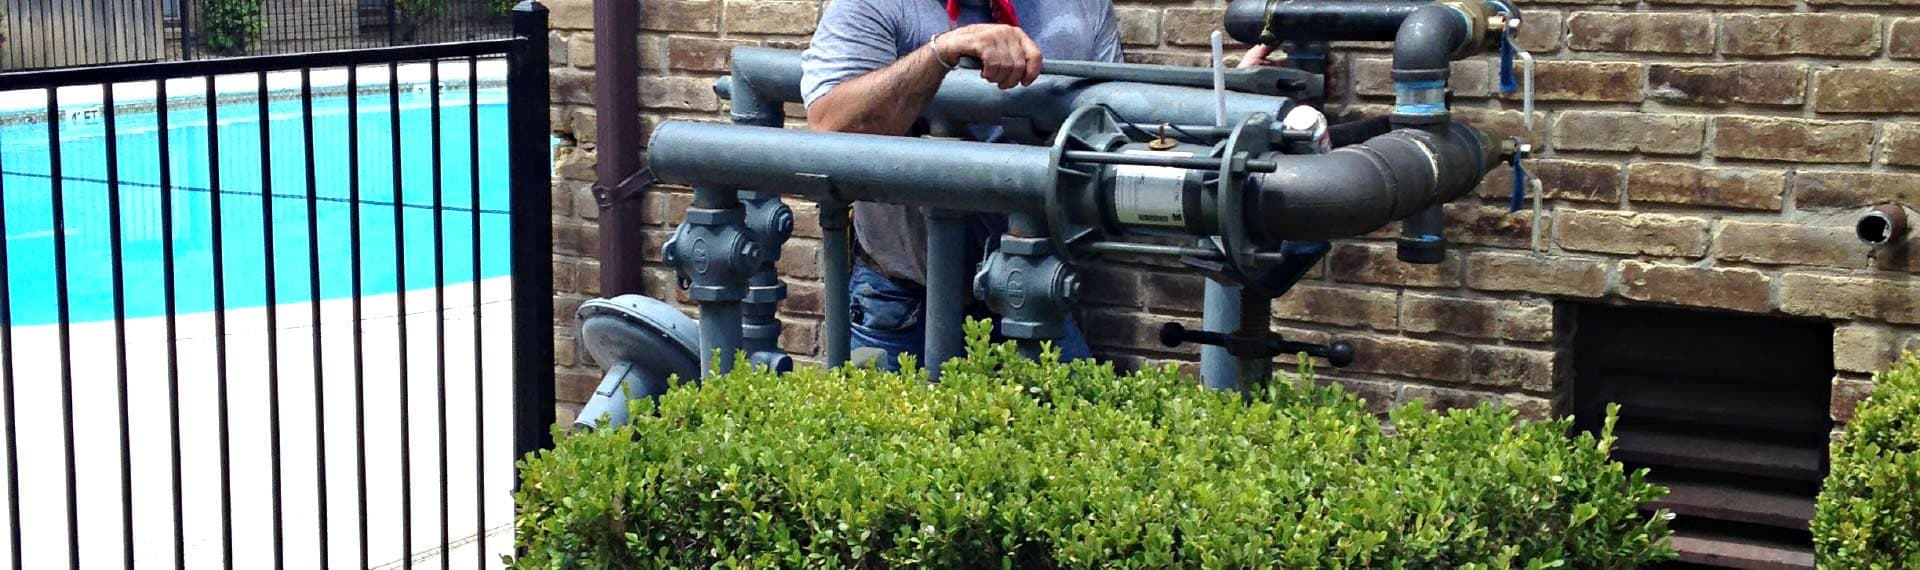 Raypak boilers  hydromatic pumps   commercial water softeners   Heat & Treat expert technician   Heat & Treat Texas